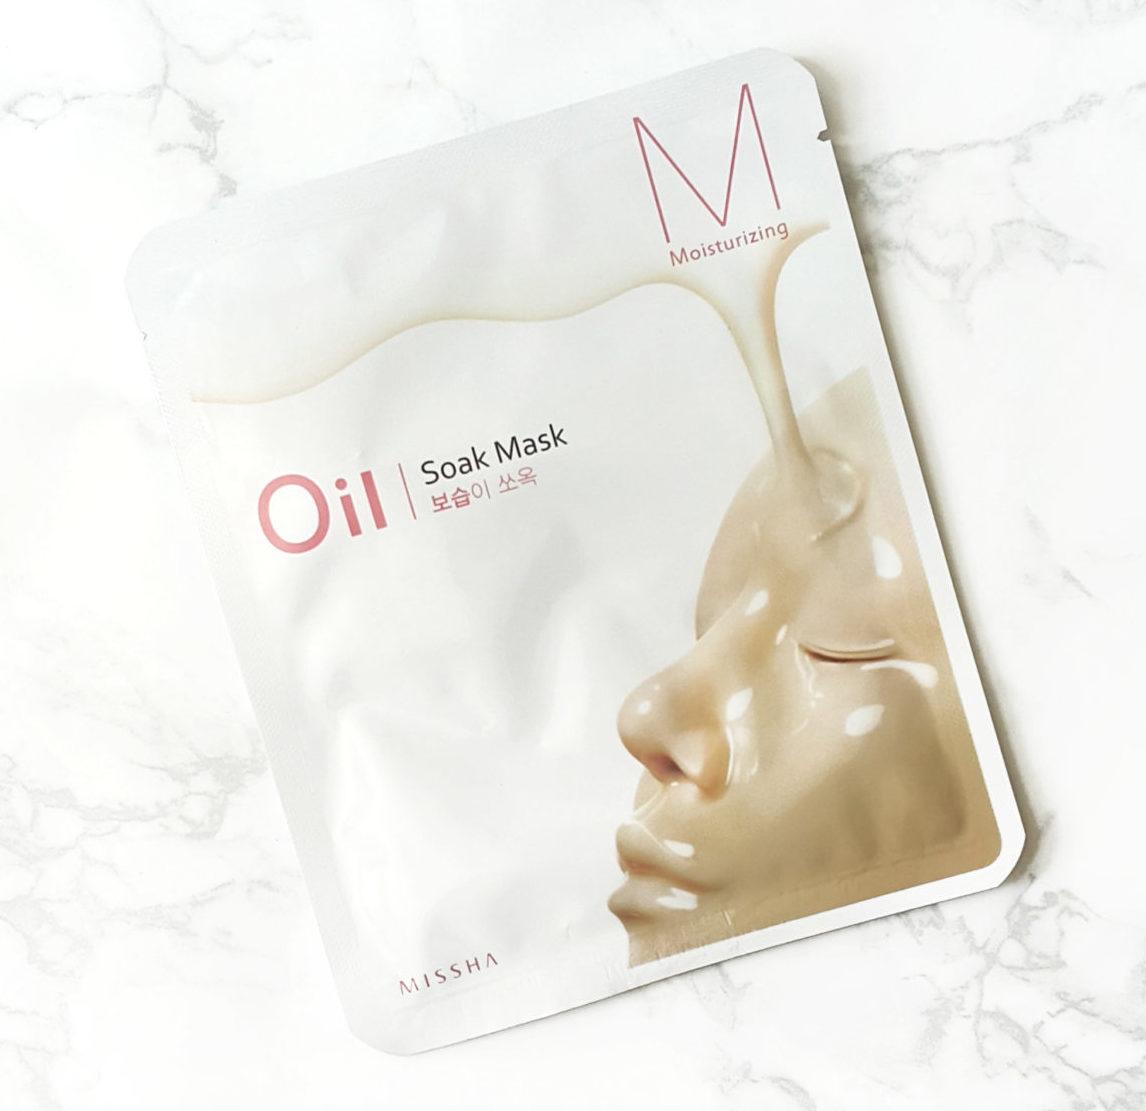 Ansiktsmask - MISSHA Oil-Soak Mask [Moisturizing]